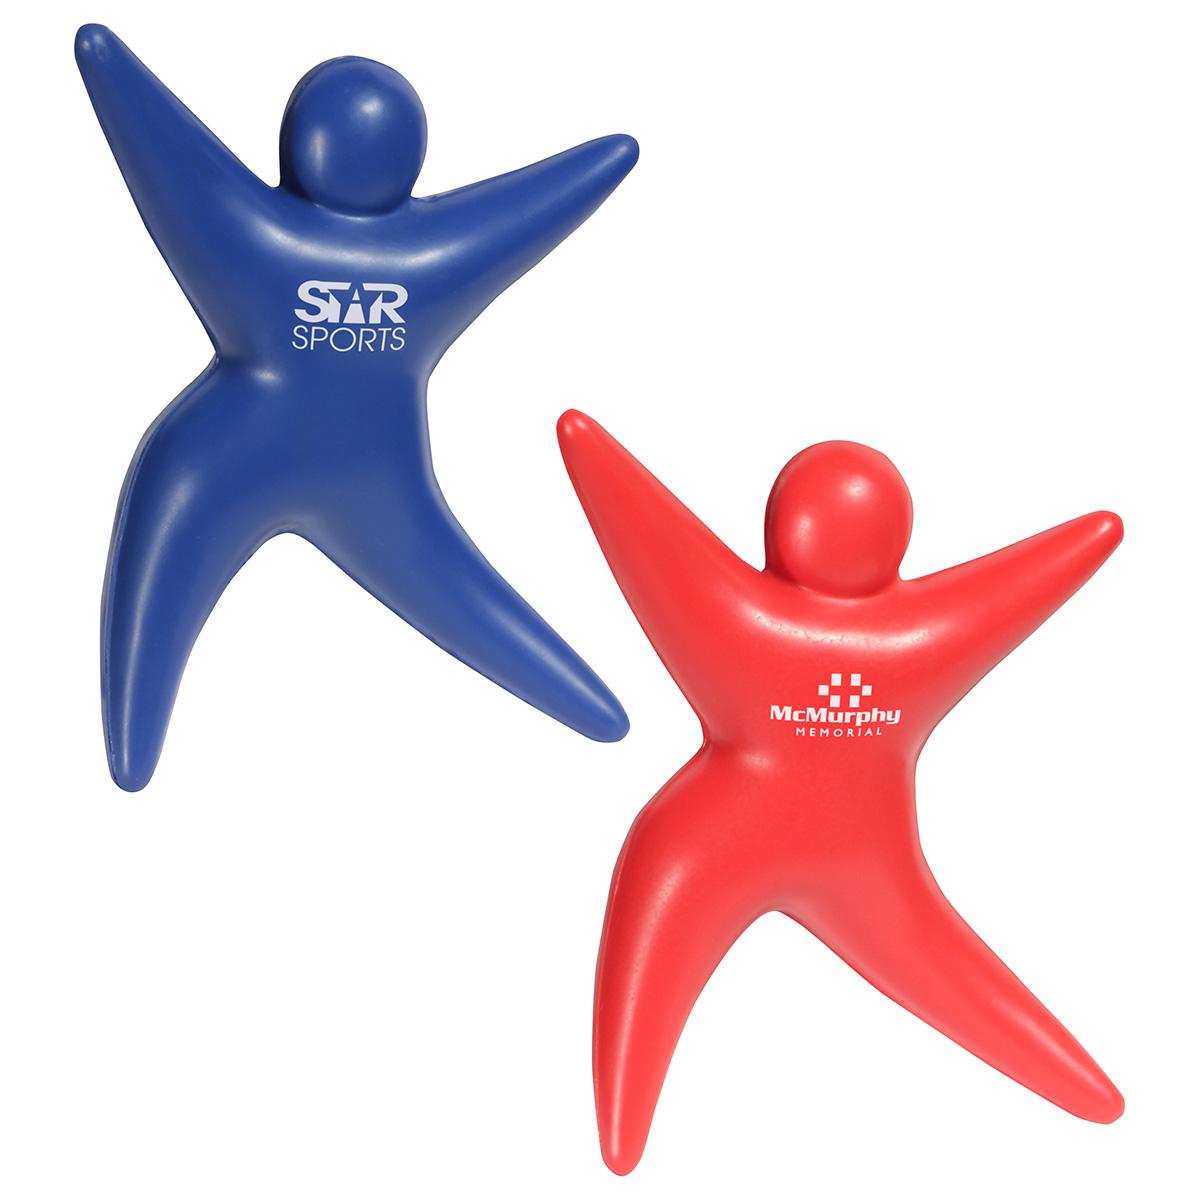 Starman Stress Reliever, LGS-SM17, 1 Colour Imprint